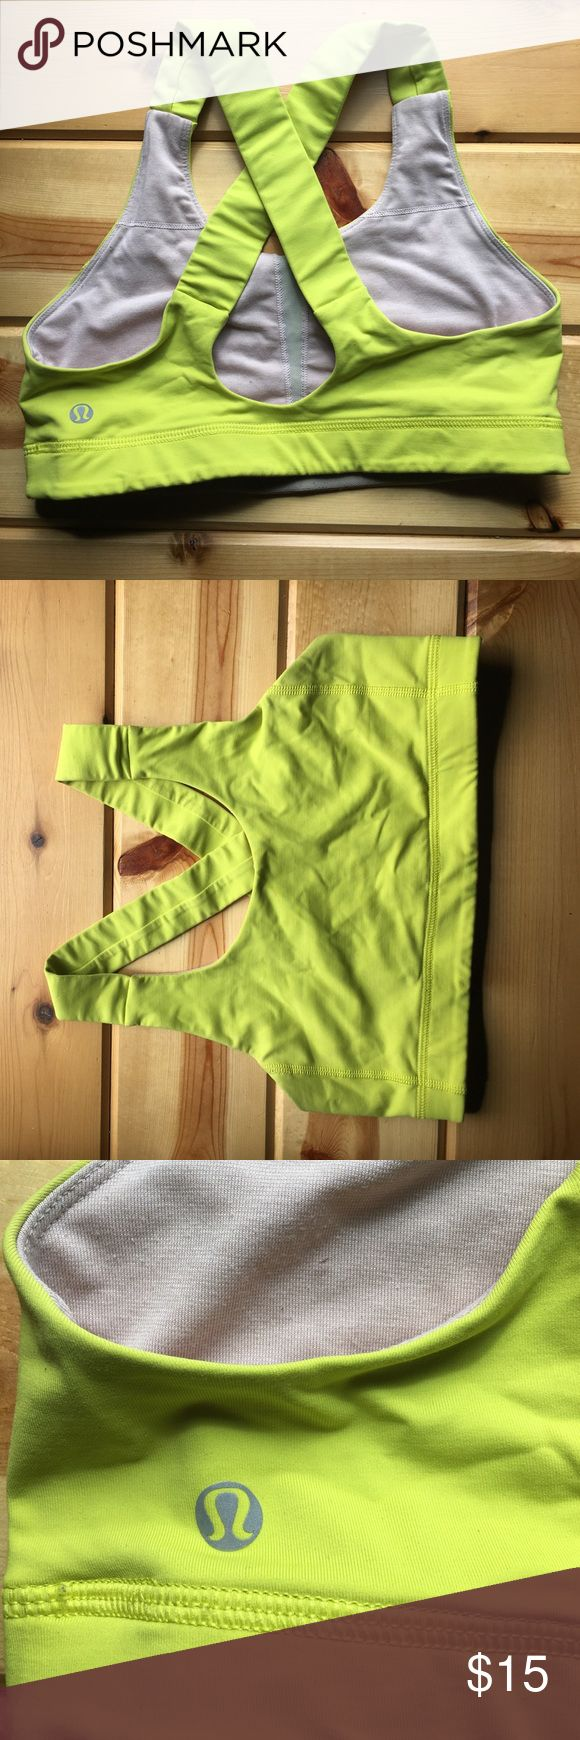 Neon yellow lululemon sports bra Size 6! Lululemon neon yellow sports bra, a few years old but still in great condition. lululemon athletica Intimates & Sleepwear Bras